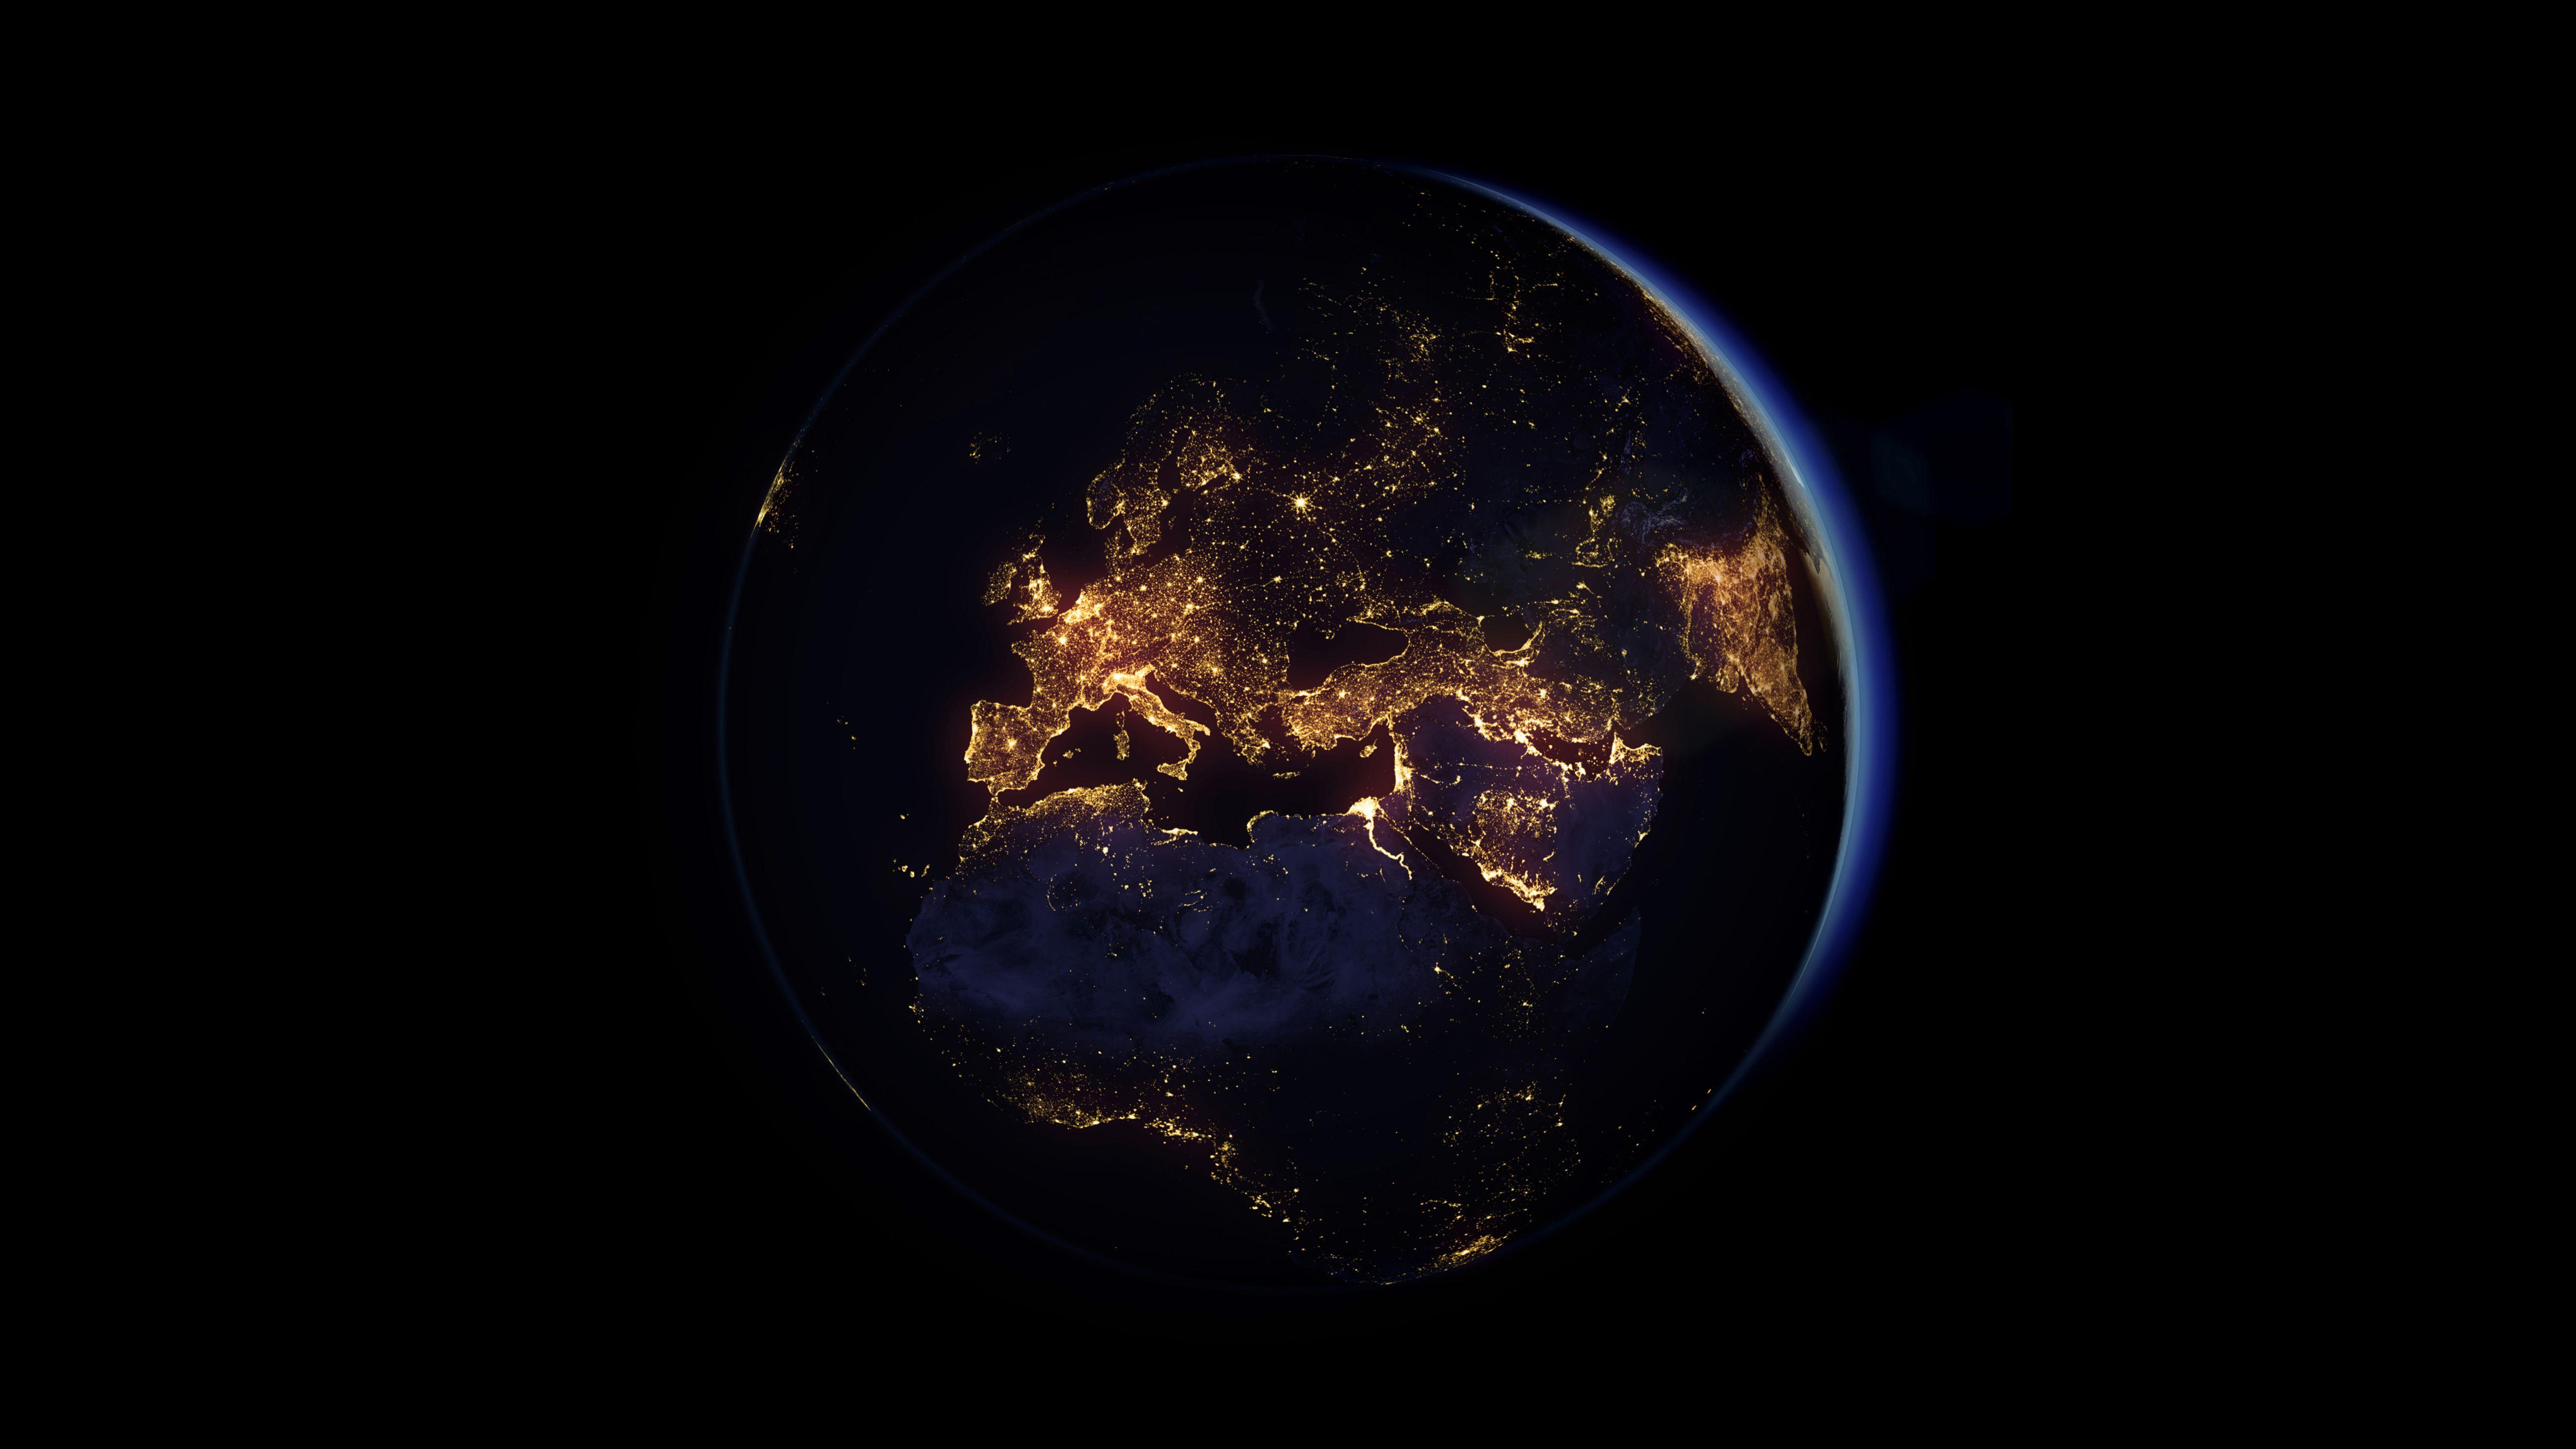 4k Earth Wallpapers On Wallpaperdog